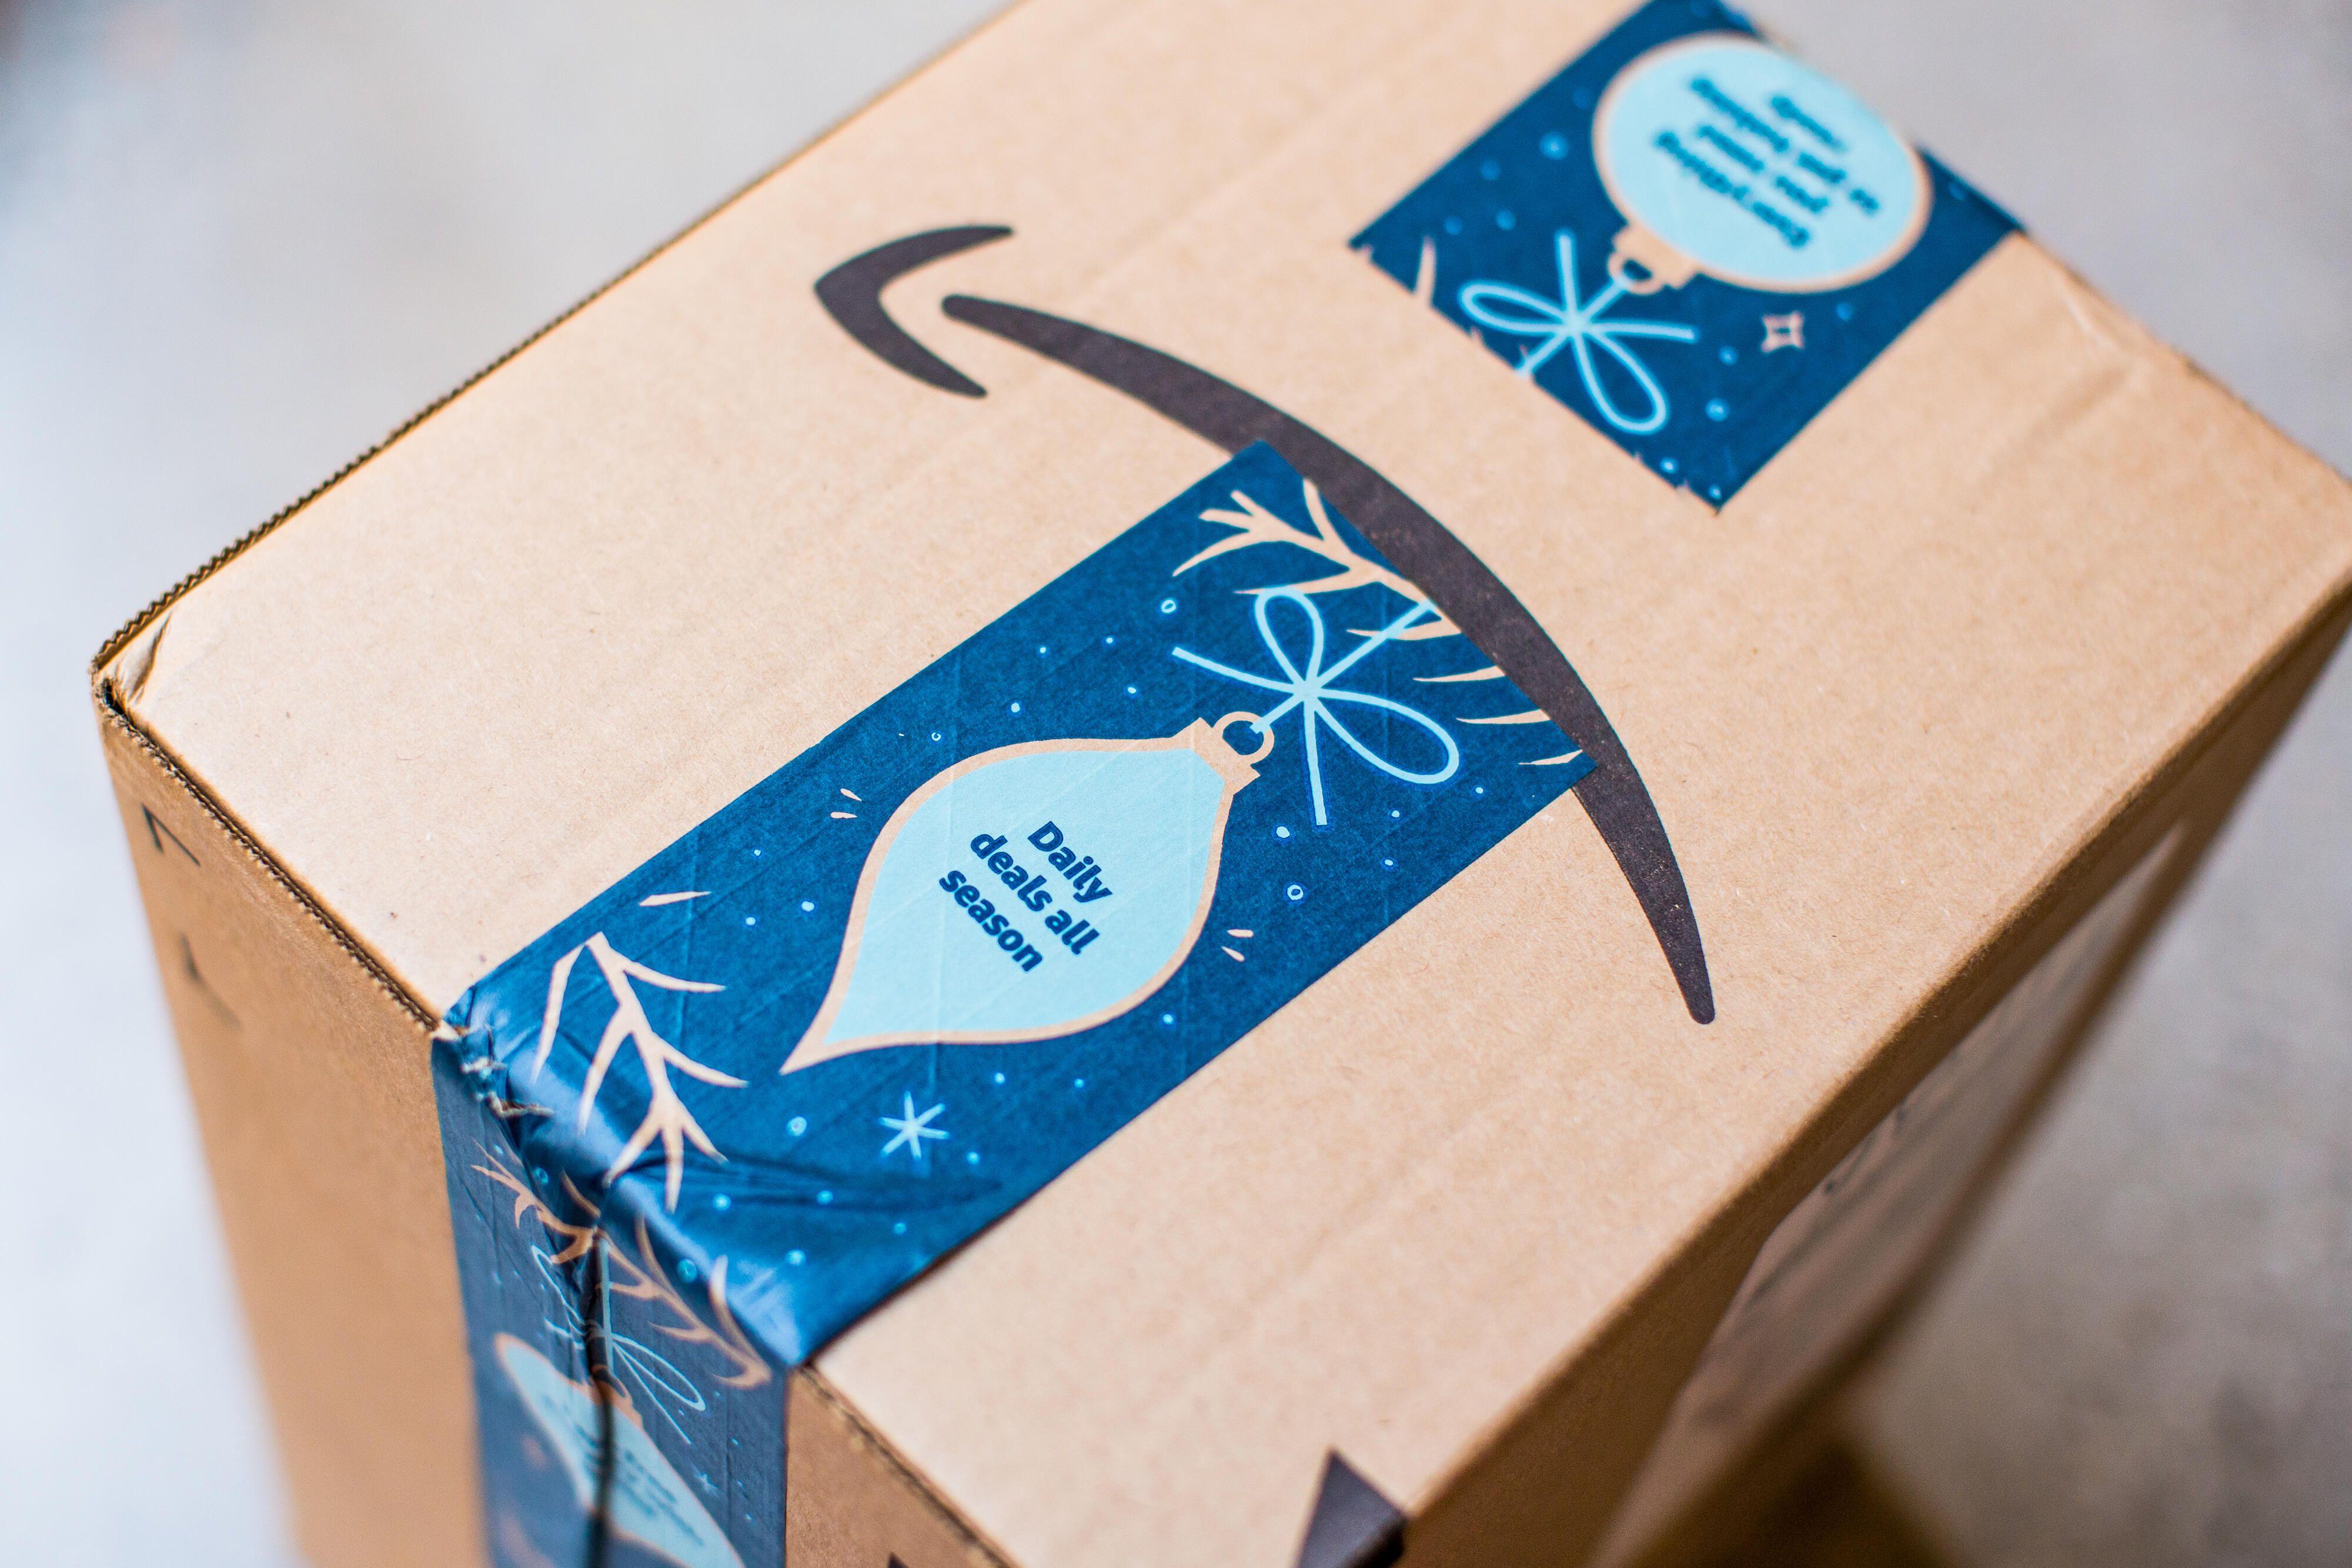 amazon-delivery-box-3669